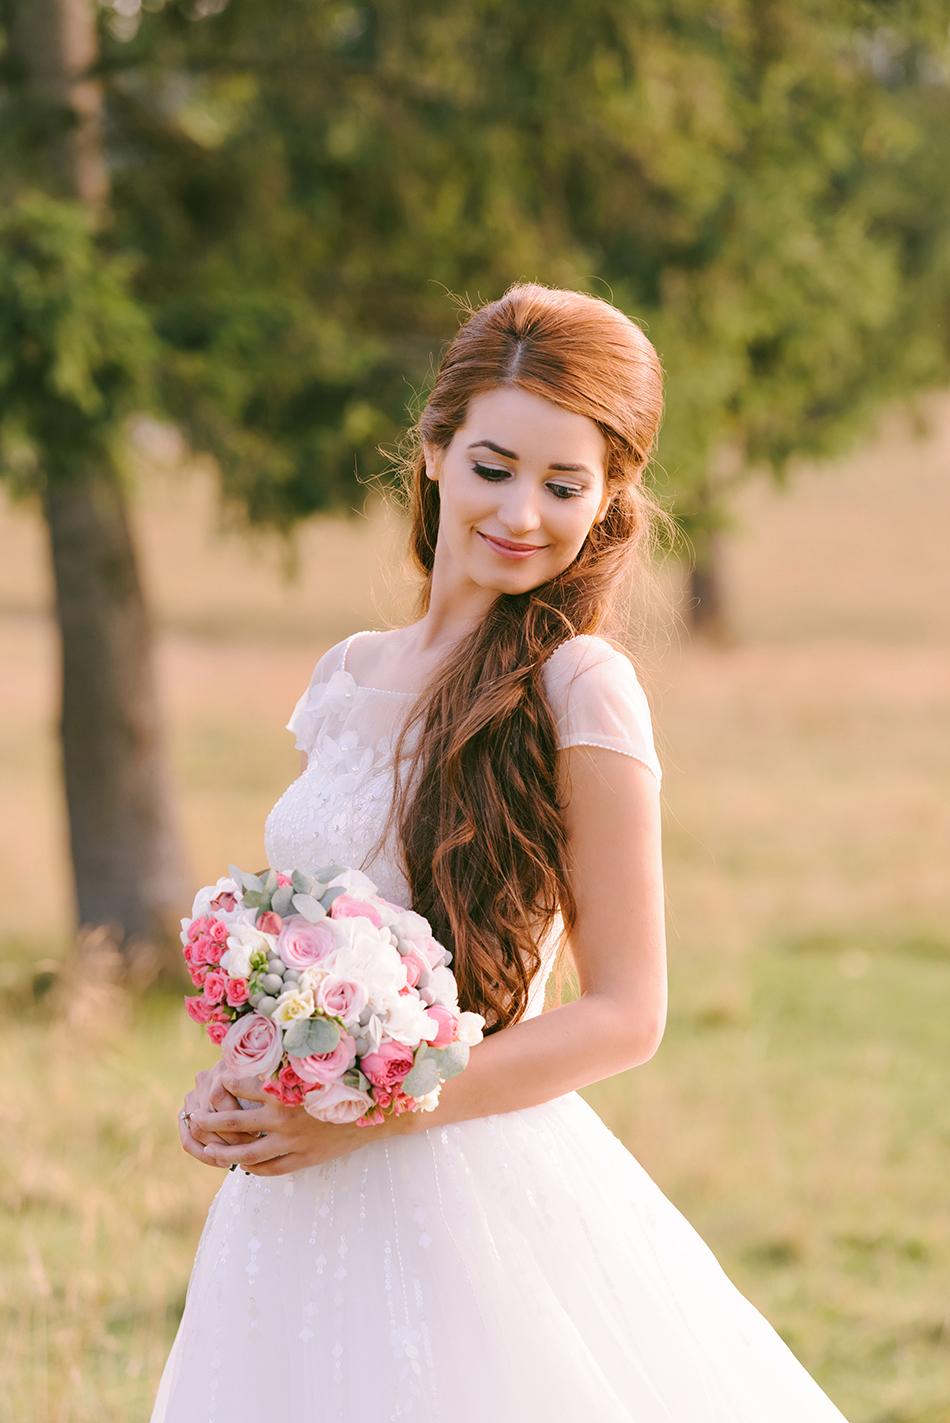 AD Passion Photography | fotograf-nunta-brasov-poiana-brasov-fotograf-profesionist_lorena-cristi_0095 | Adelin, Dida, fotograf profesionist, fotograf de nunta, fotografie de nunta, fotograf Timisoara, fotograf Craiova, fotograf Bucuresti, fotograf Arad, nunta Timisoara, nunta Arad, nunta Bucuresti, nunta Craiova